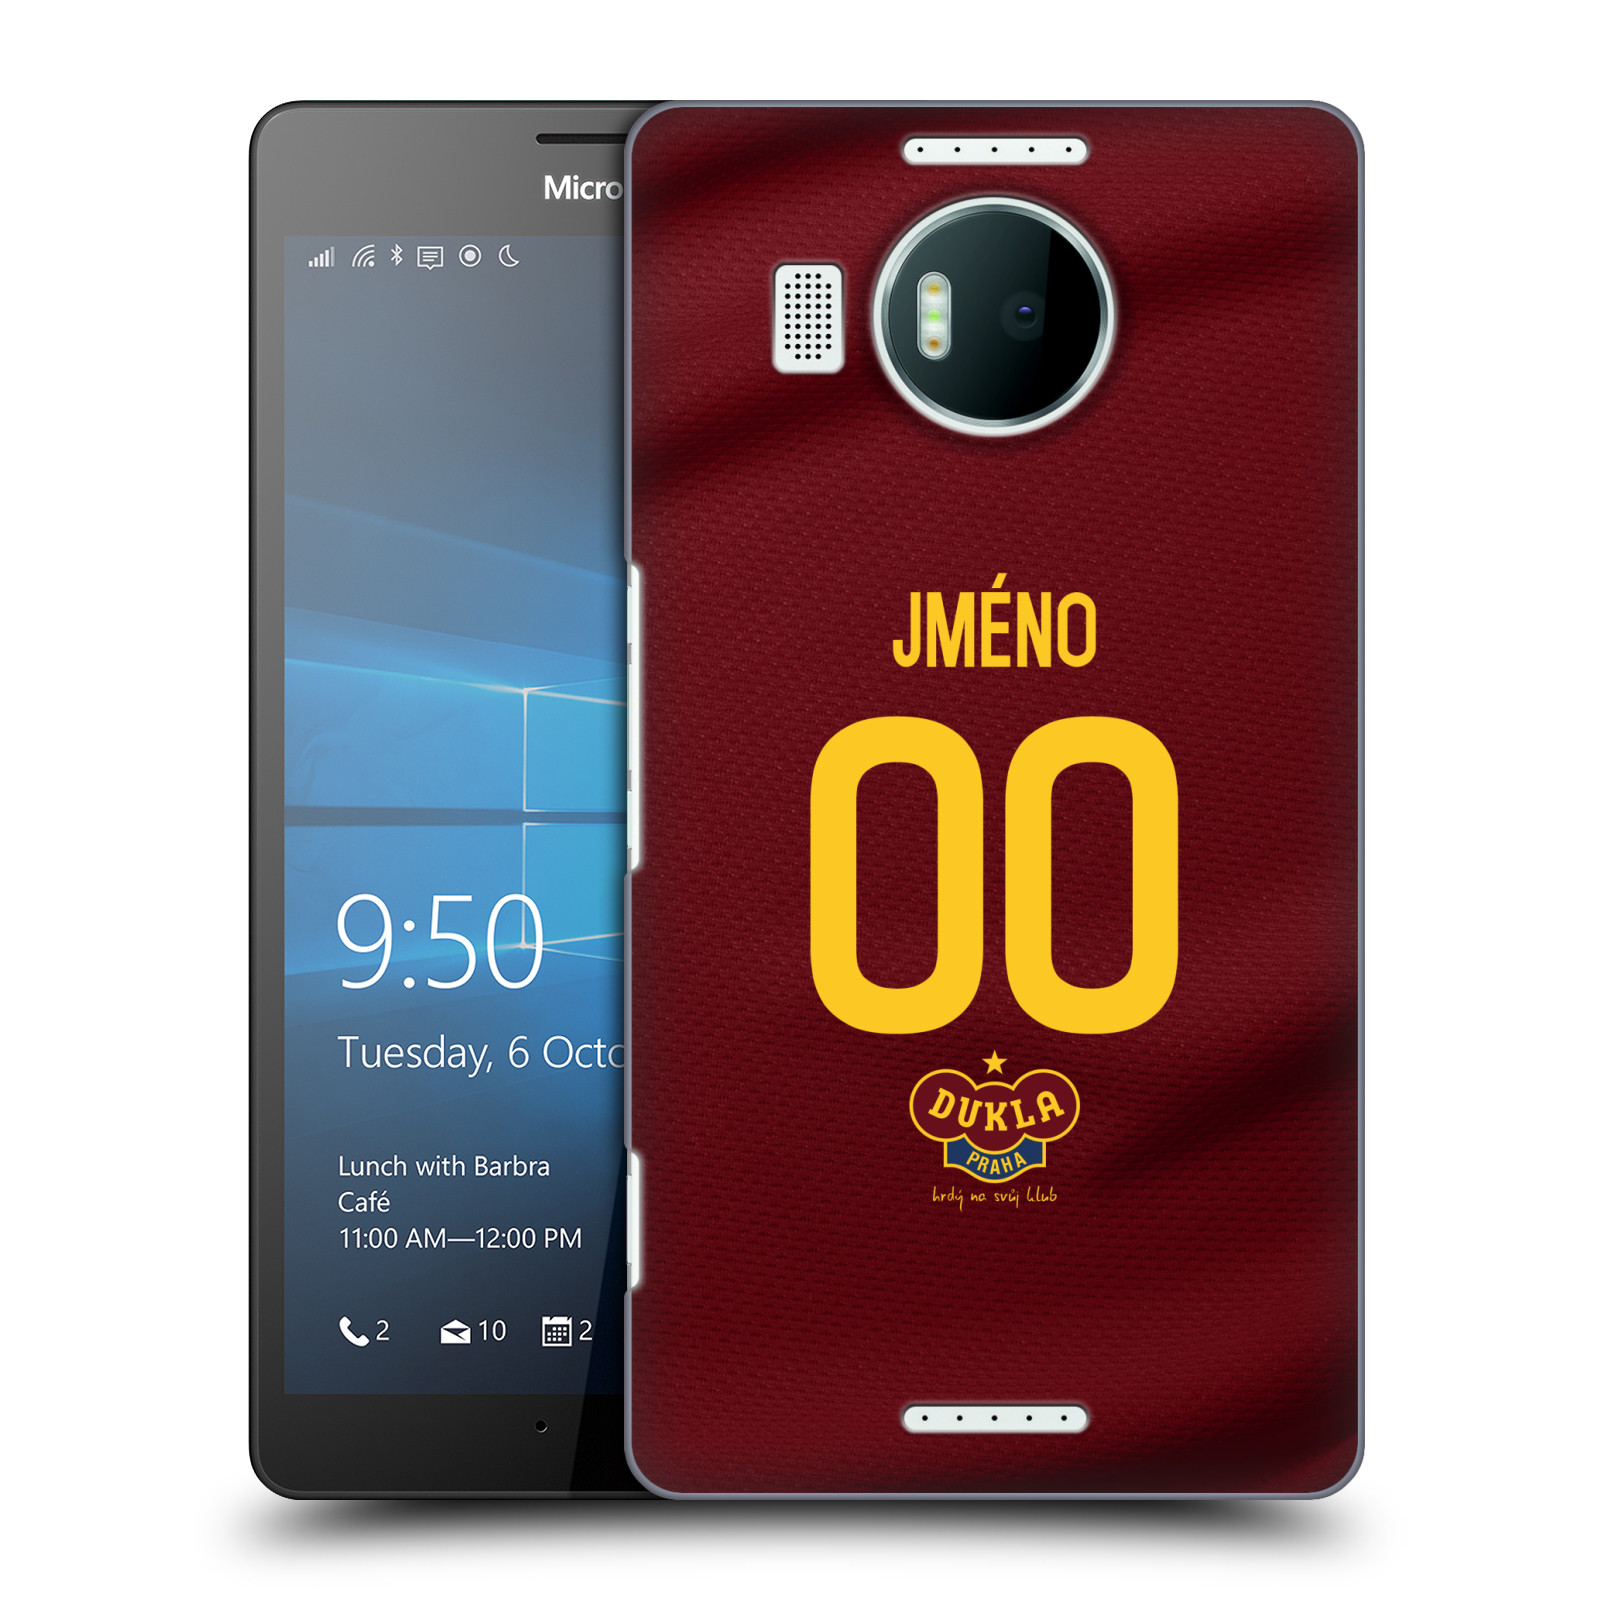 Plastové pouzdro na mobil Microsoft Lumia 950 XL - FK Dukla Praha - dres s vlastním jménem a číslem